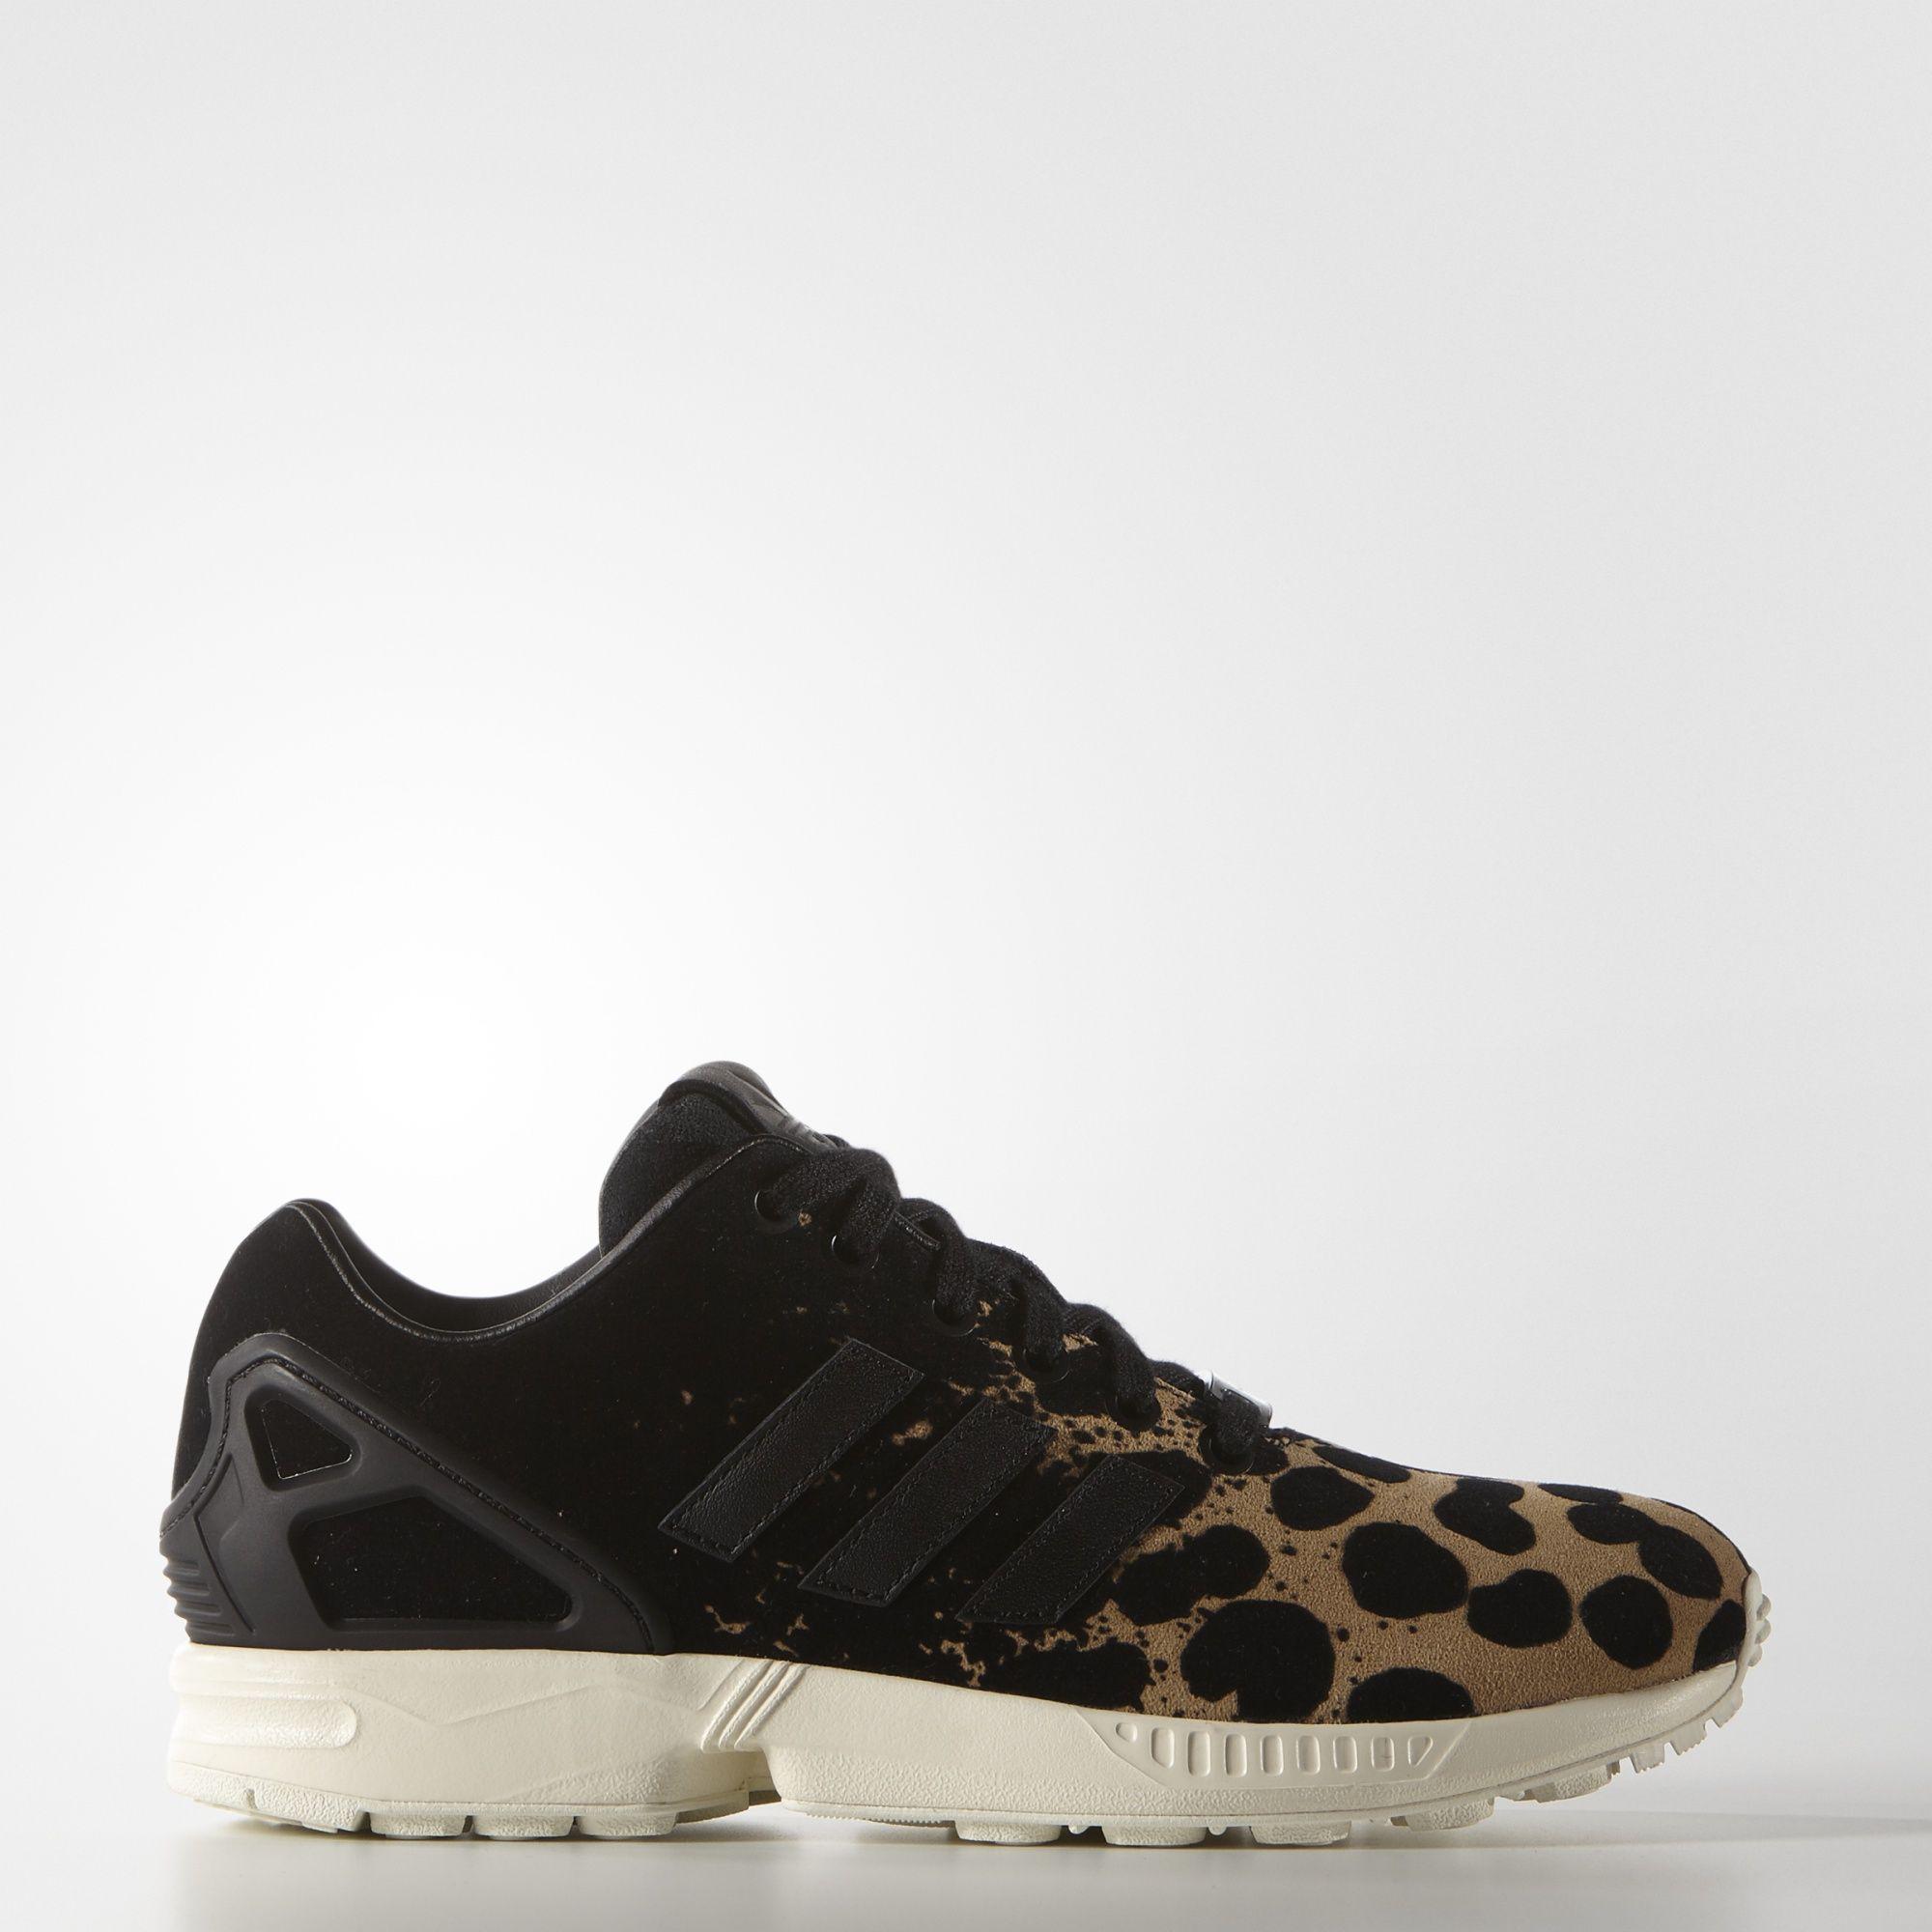 adidas ZX Flux Shoes Black | adidas Ireland | Shoes